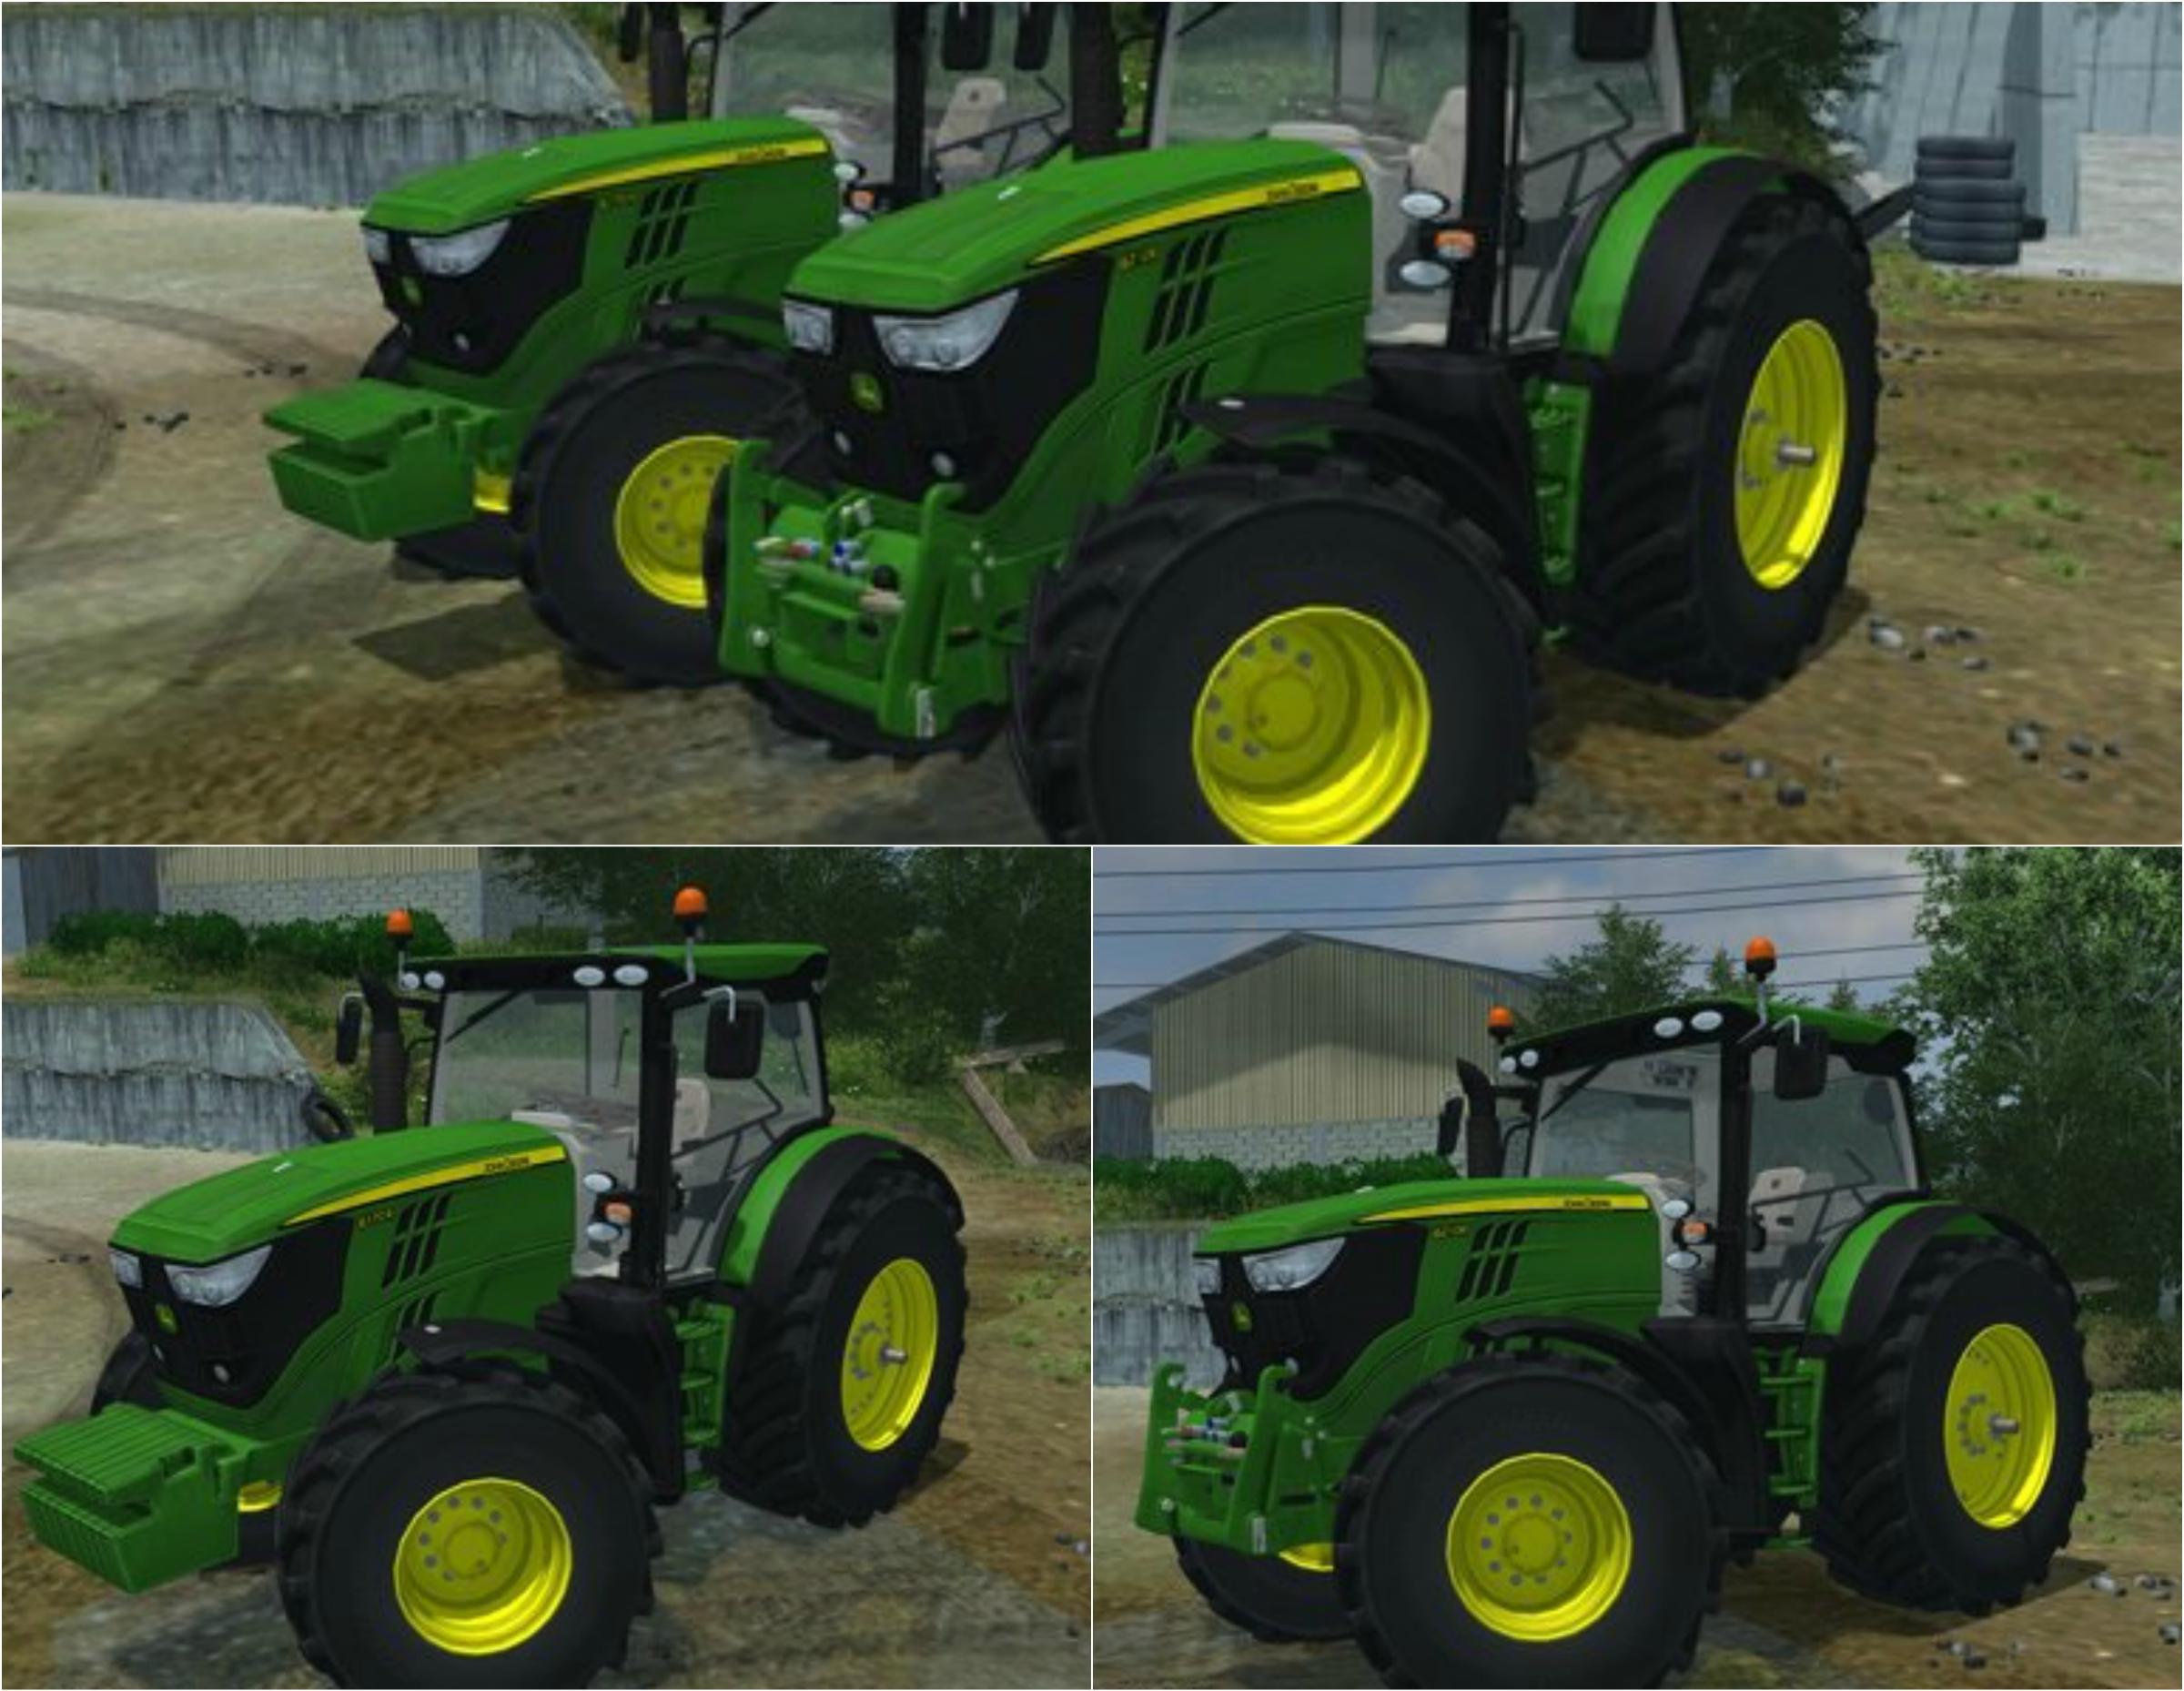 Tractor Archives • Farming simulator 19, 17, 15 mods | FS19, 17, 15 mods